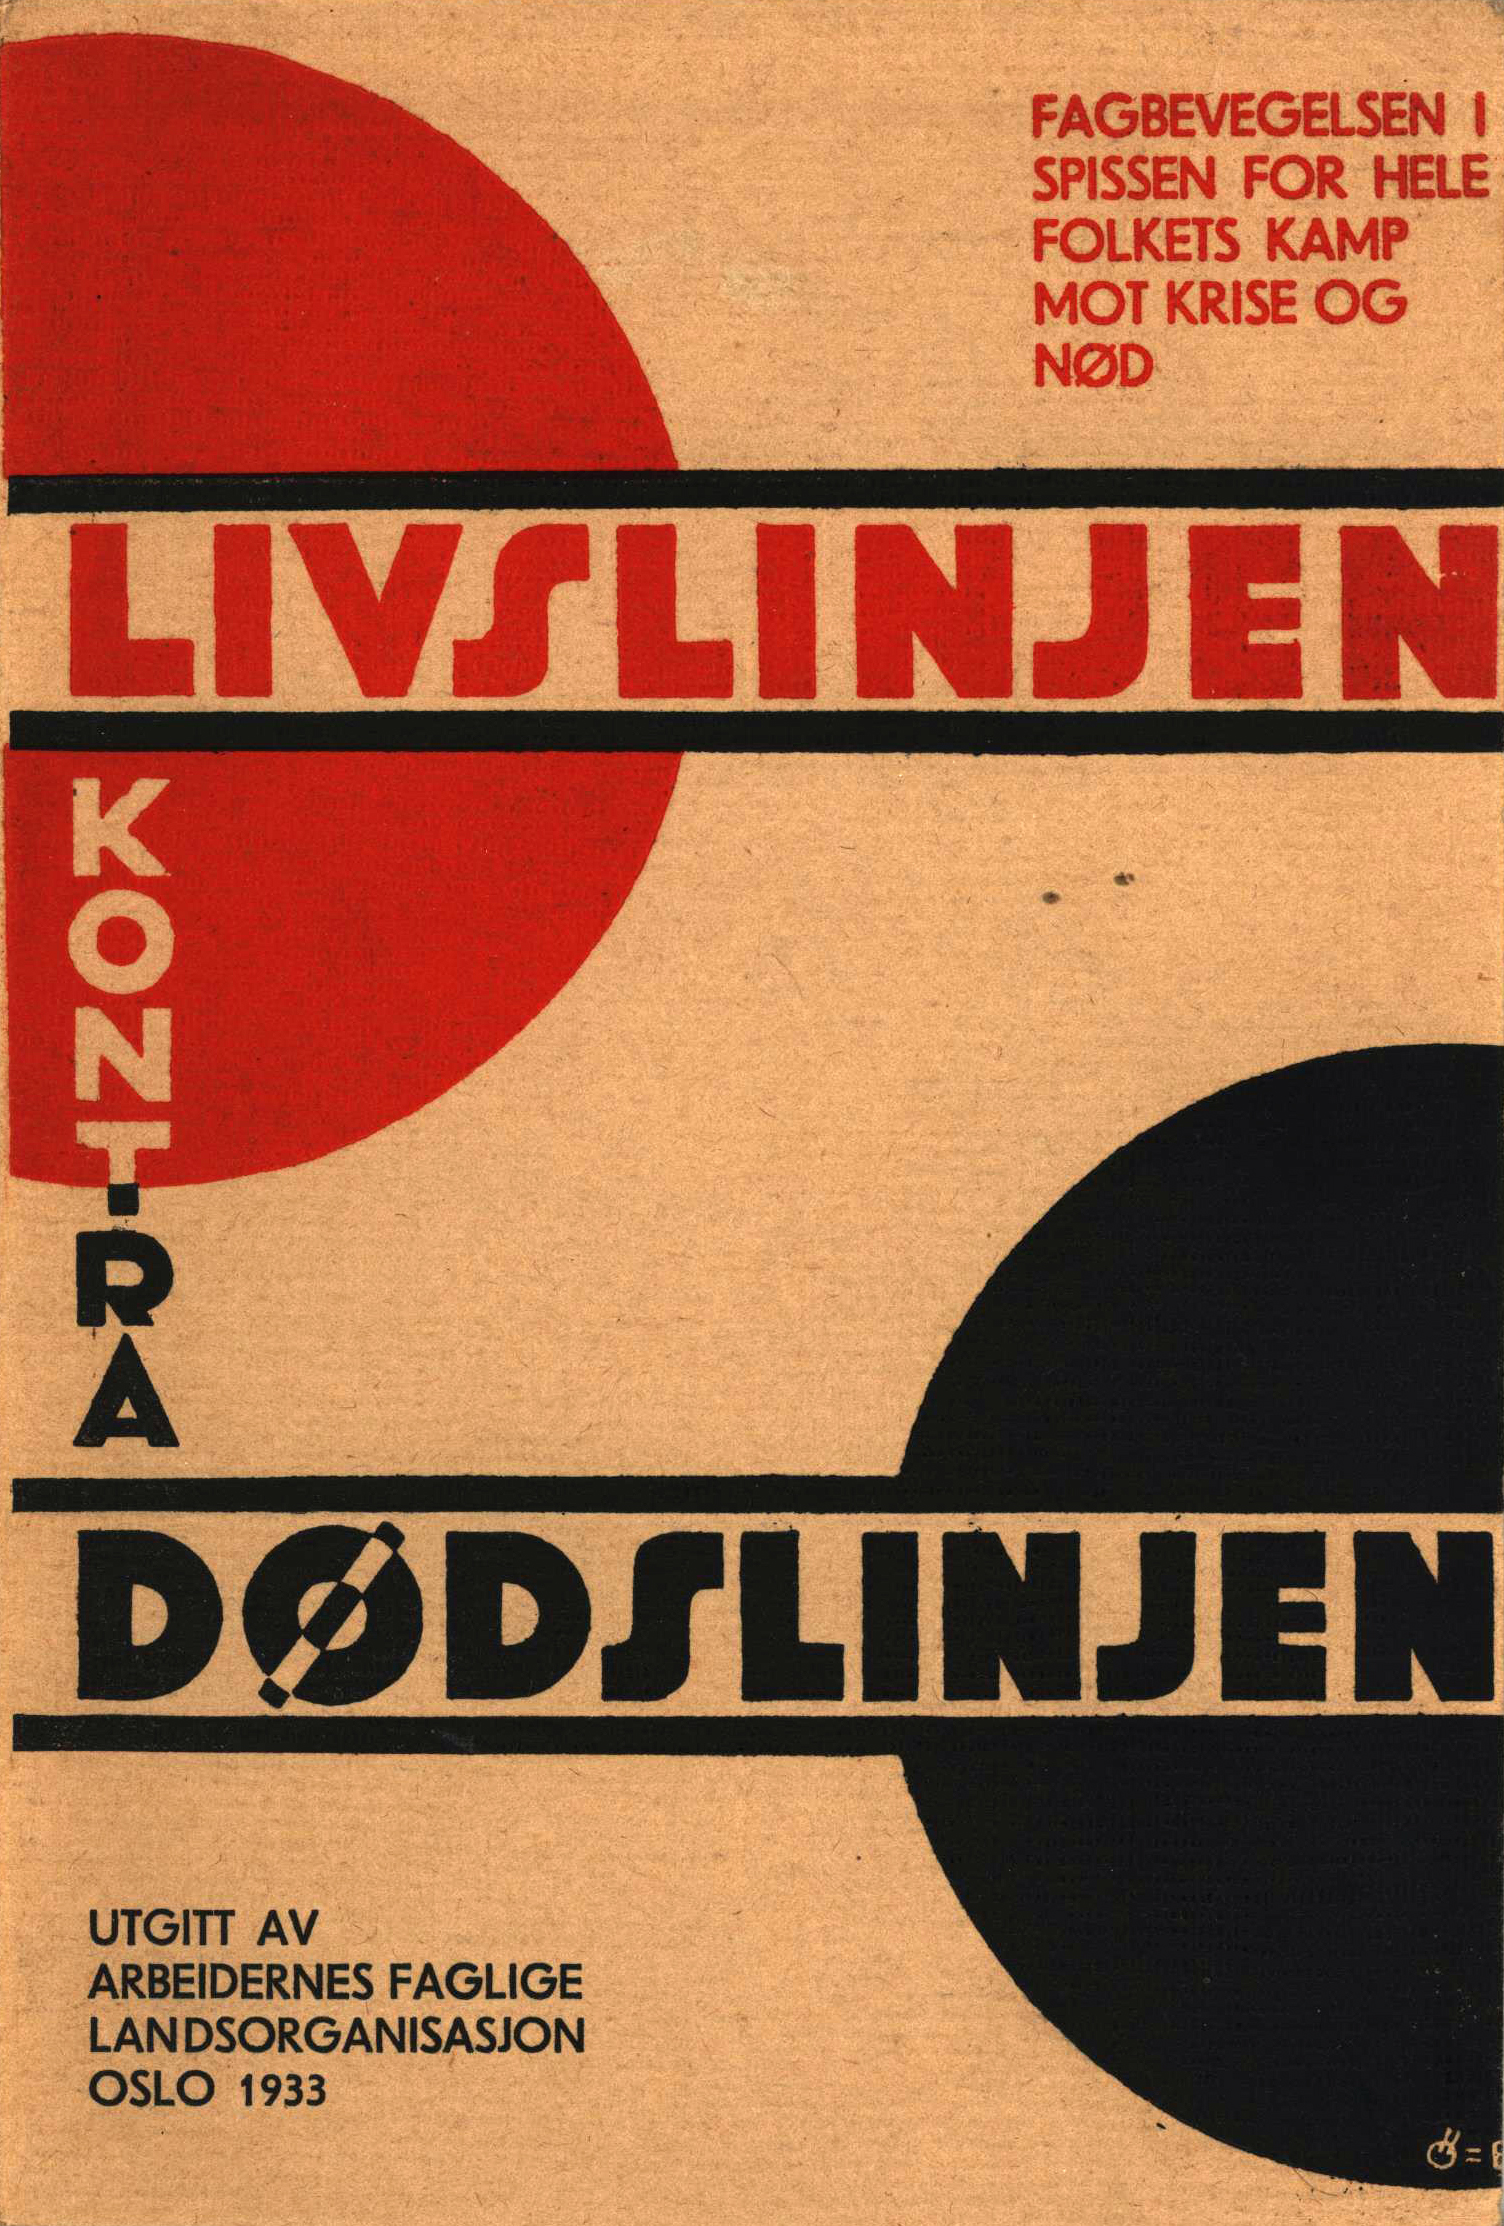 Gunnar Ousland: Livslinjen kontra dødslinjen